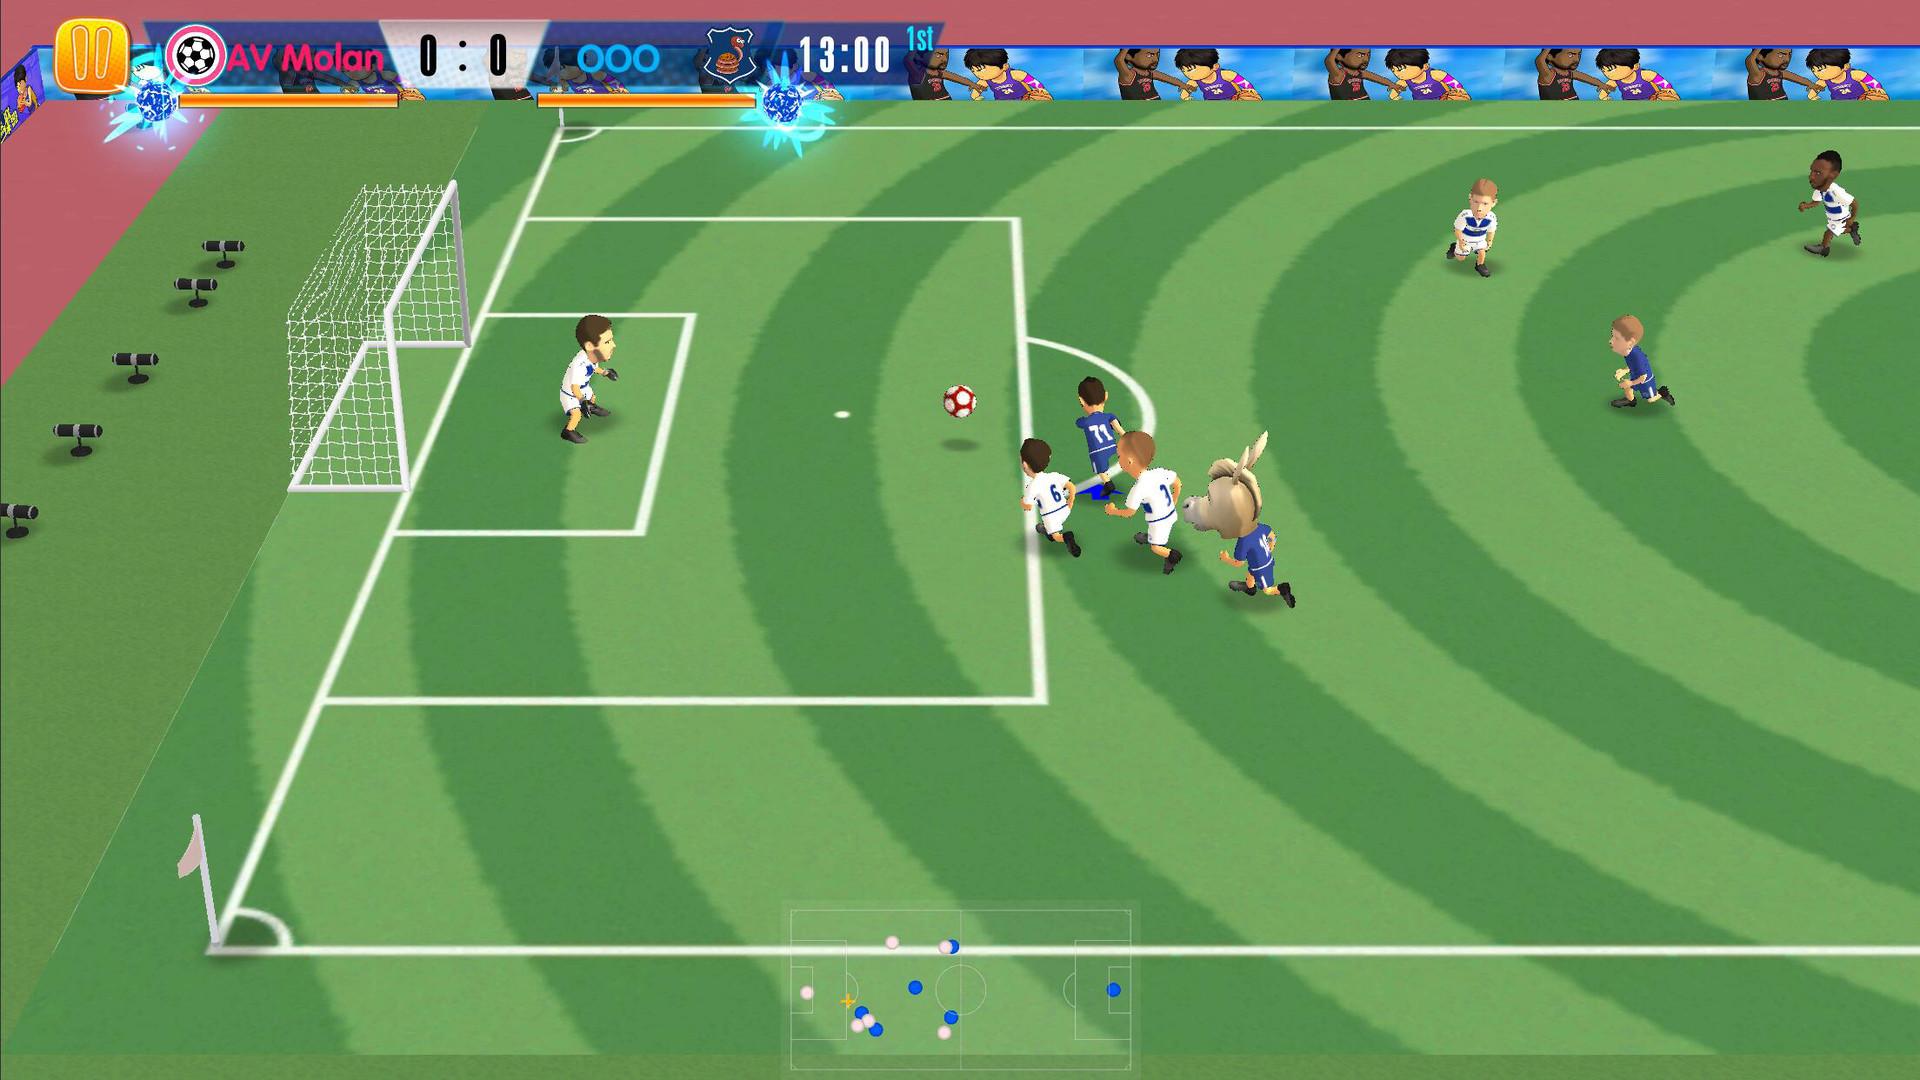 Furious Goal Free Download